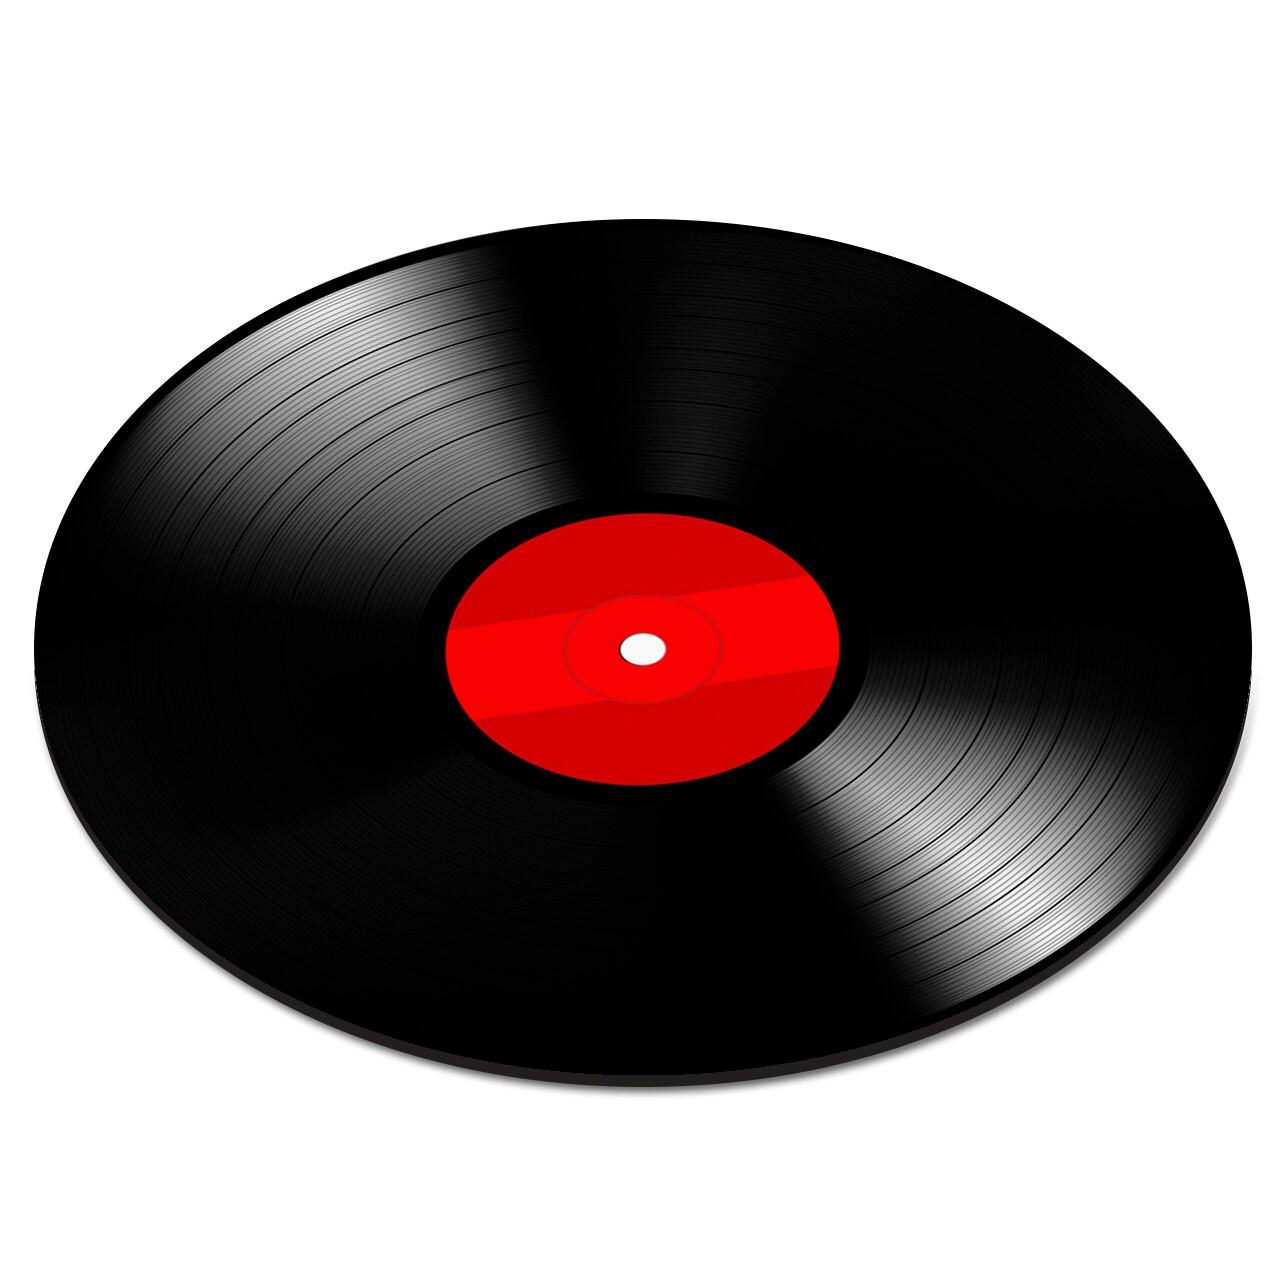 Vinyl Record Red Record Player DJ Decks Music Circle Circular Round PC Computer Mouse Mat Pad